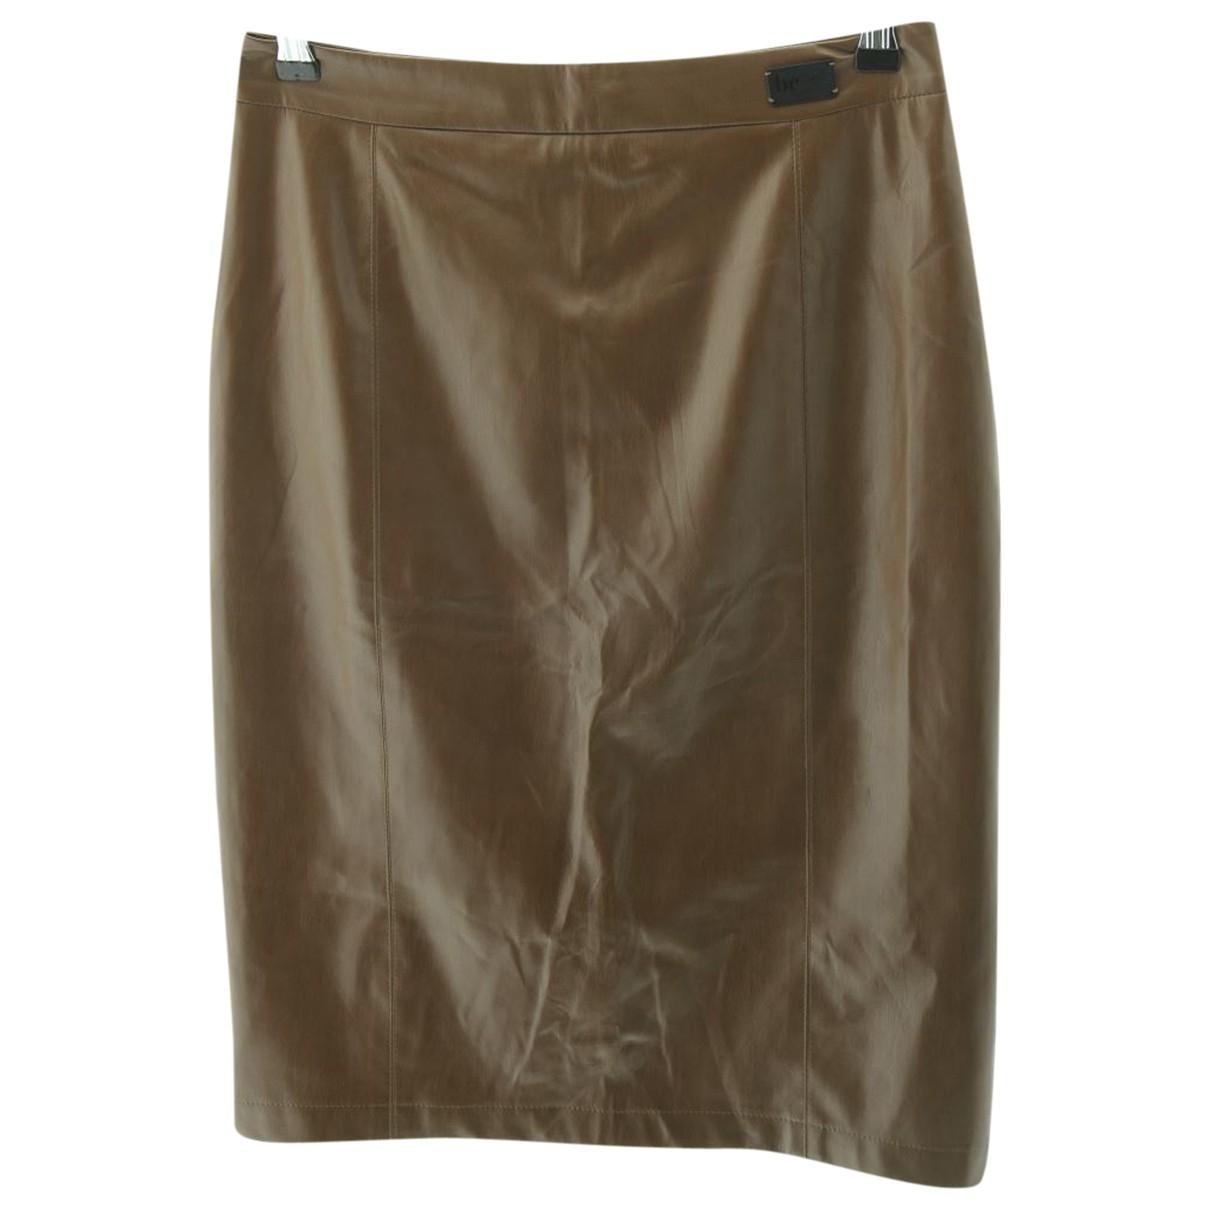 Blumarine \N Brown Fur skirt for Women 36 FR